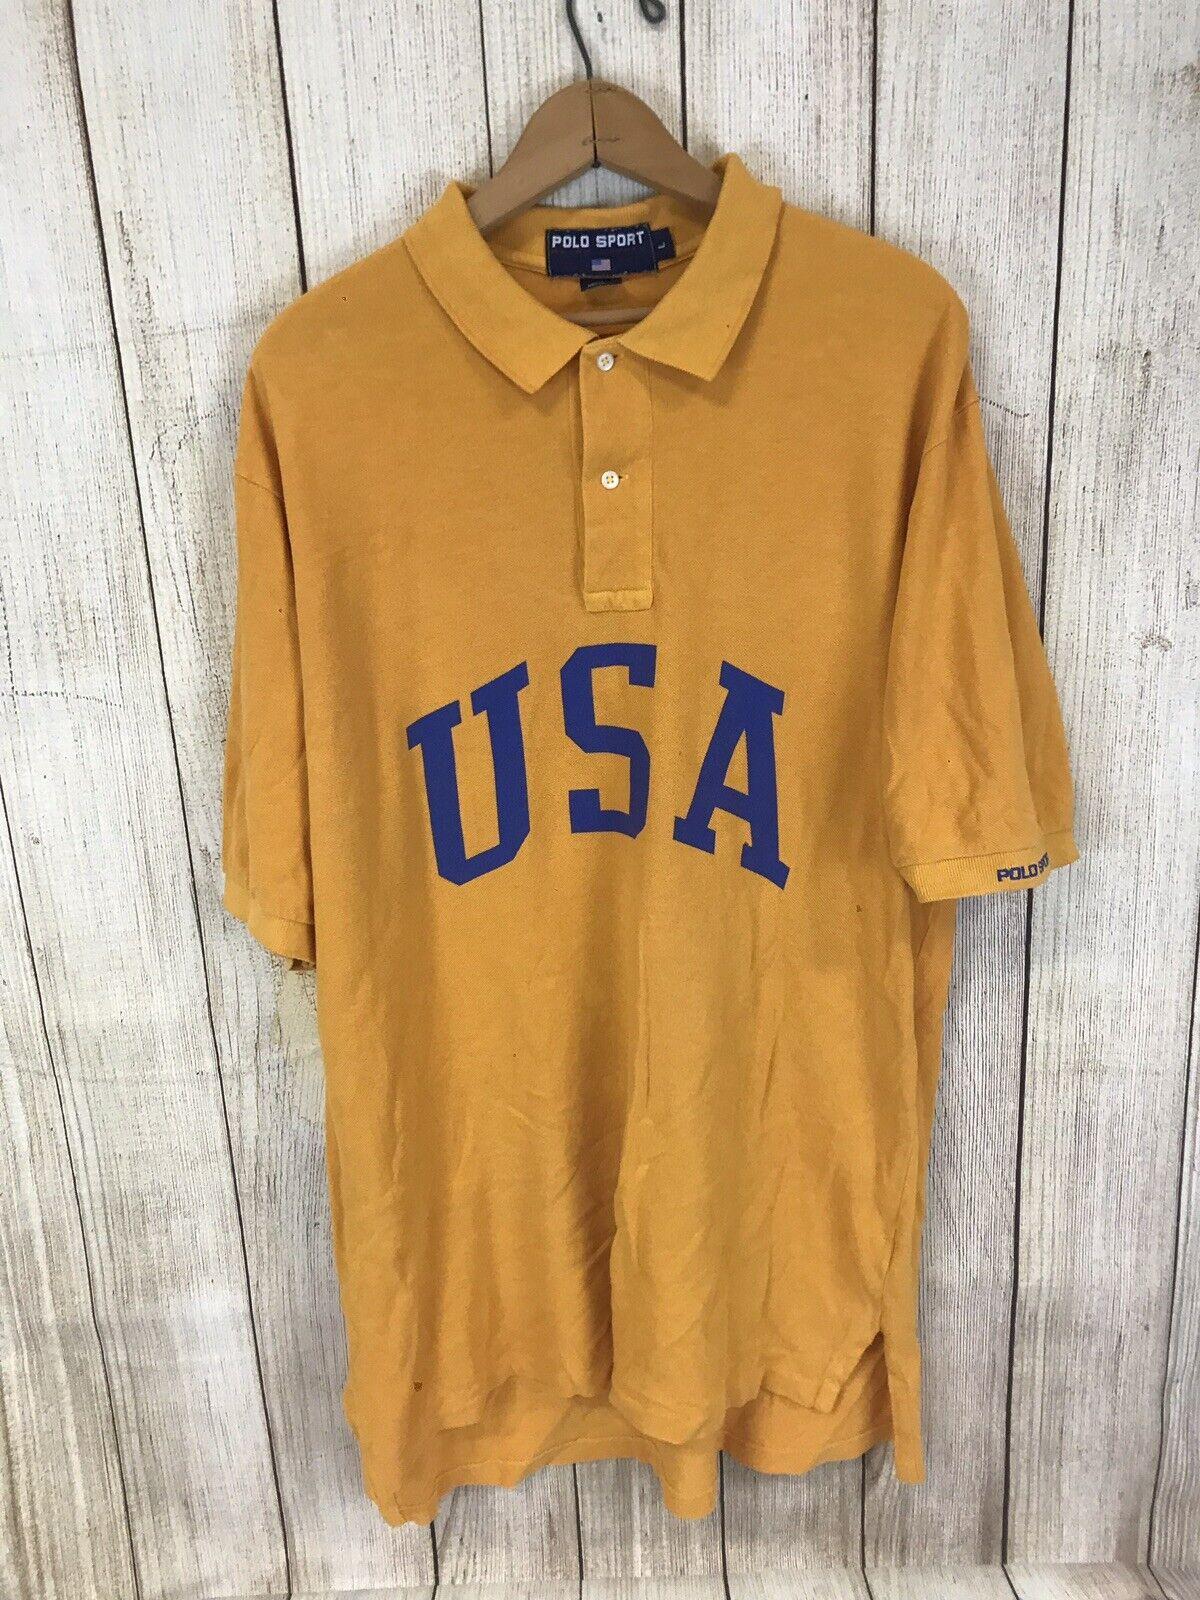 Vintage Ralph Lauren Polo Sport USA Spellout Shirt Men's L Stadium 90's